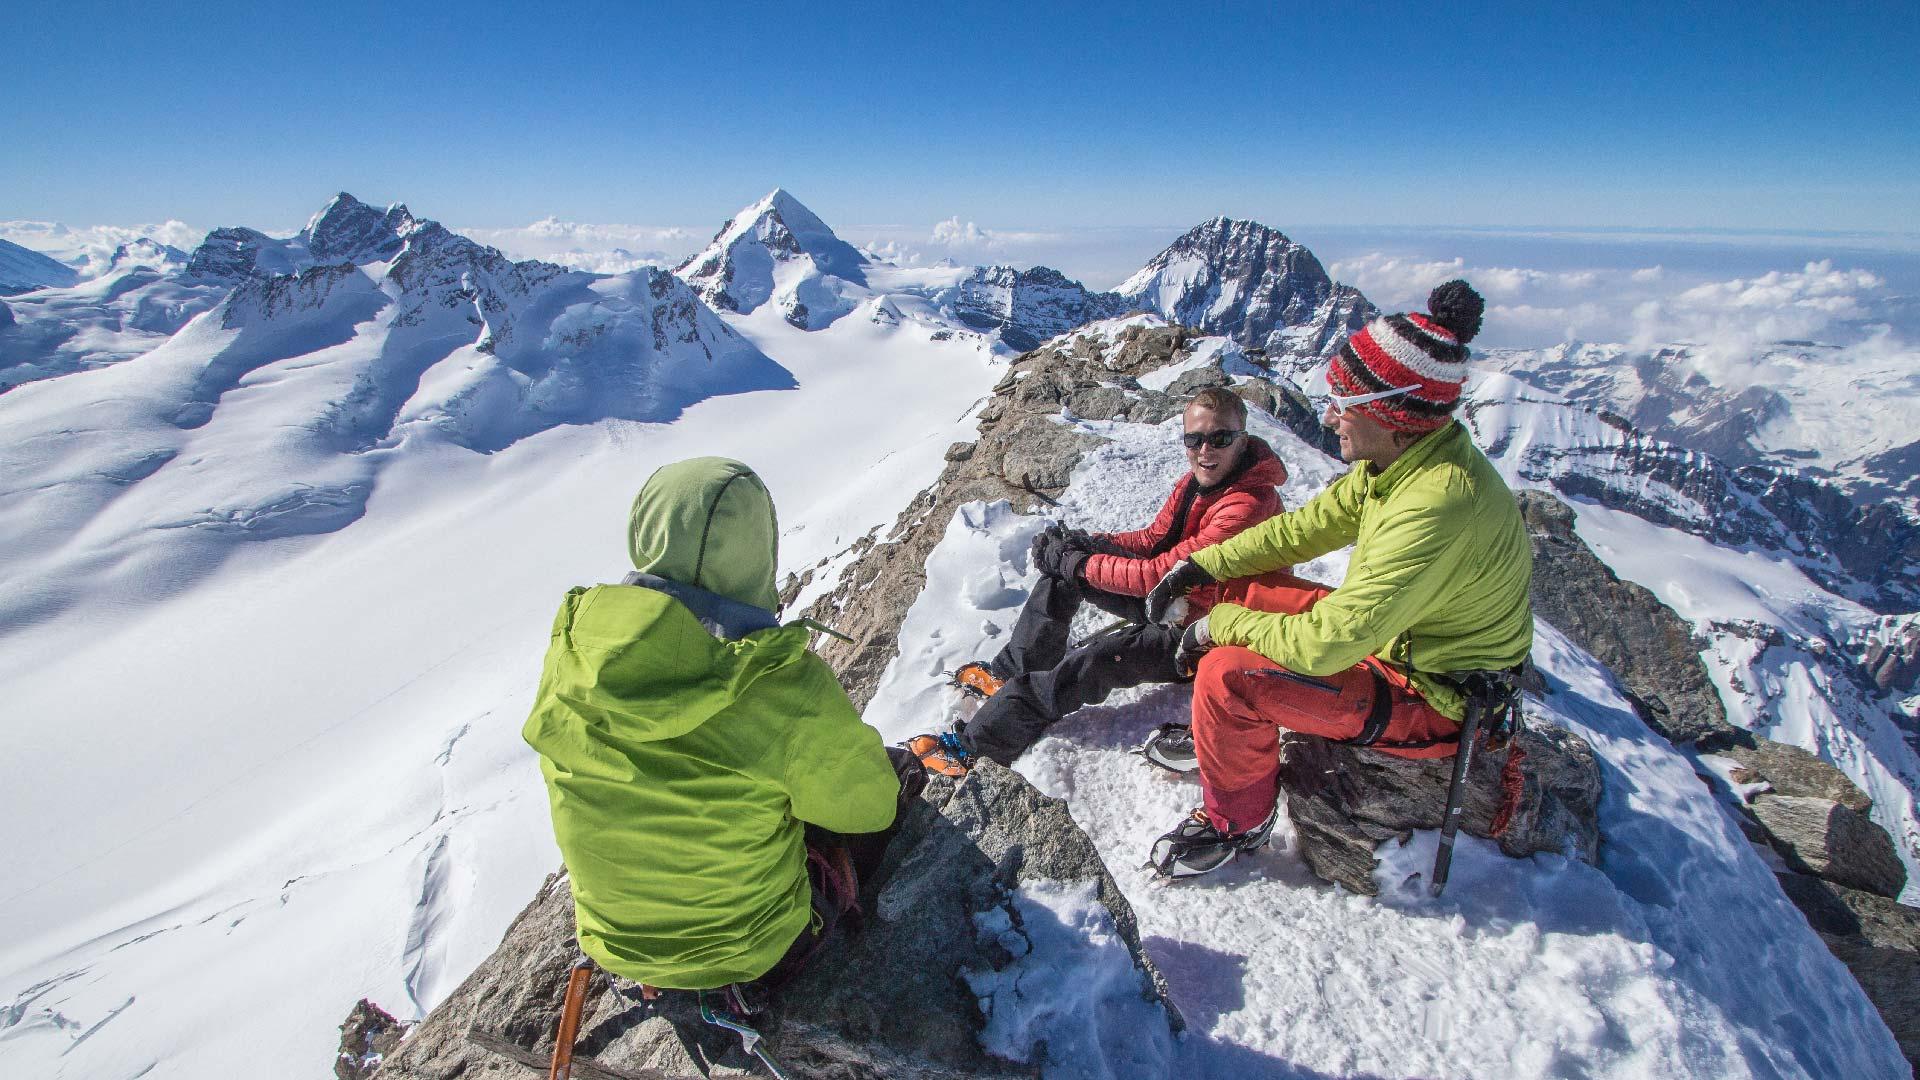 grindelwald-sports-bergsteiger-winter-gipfel